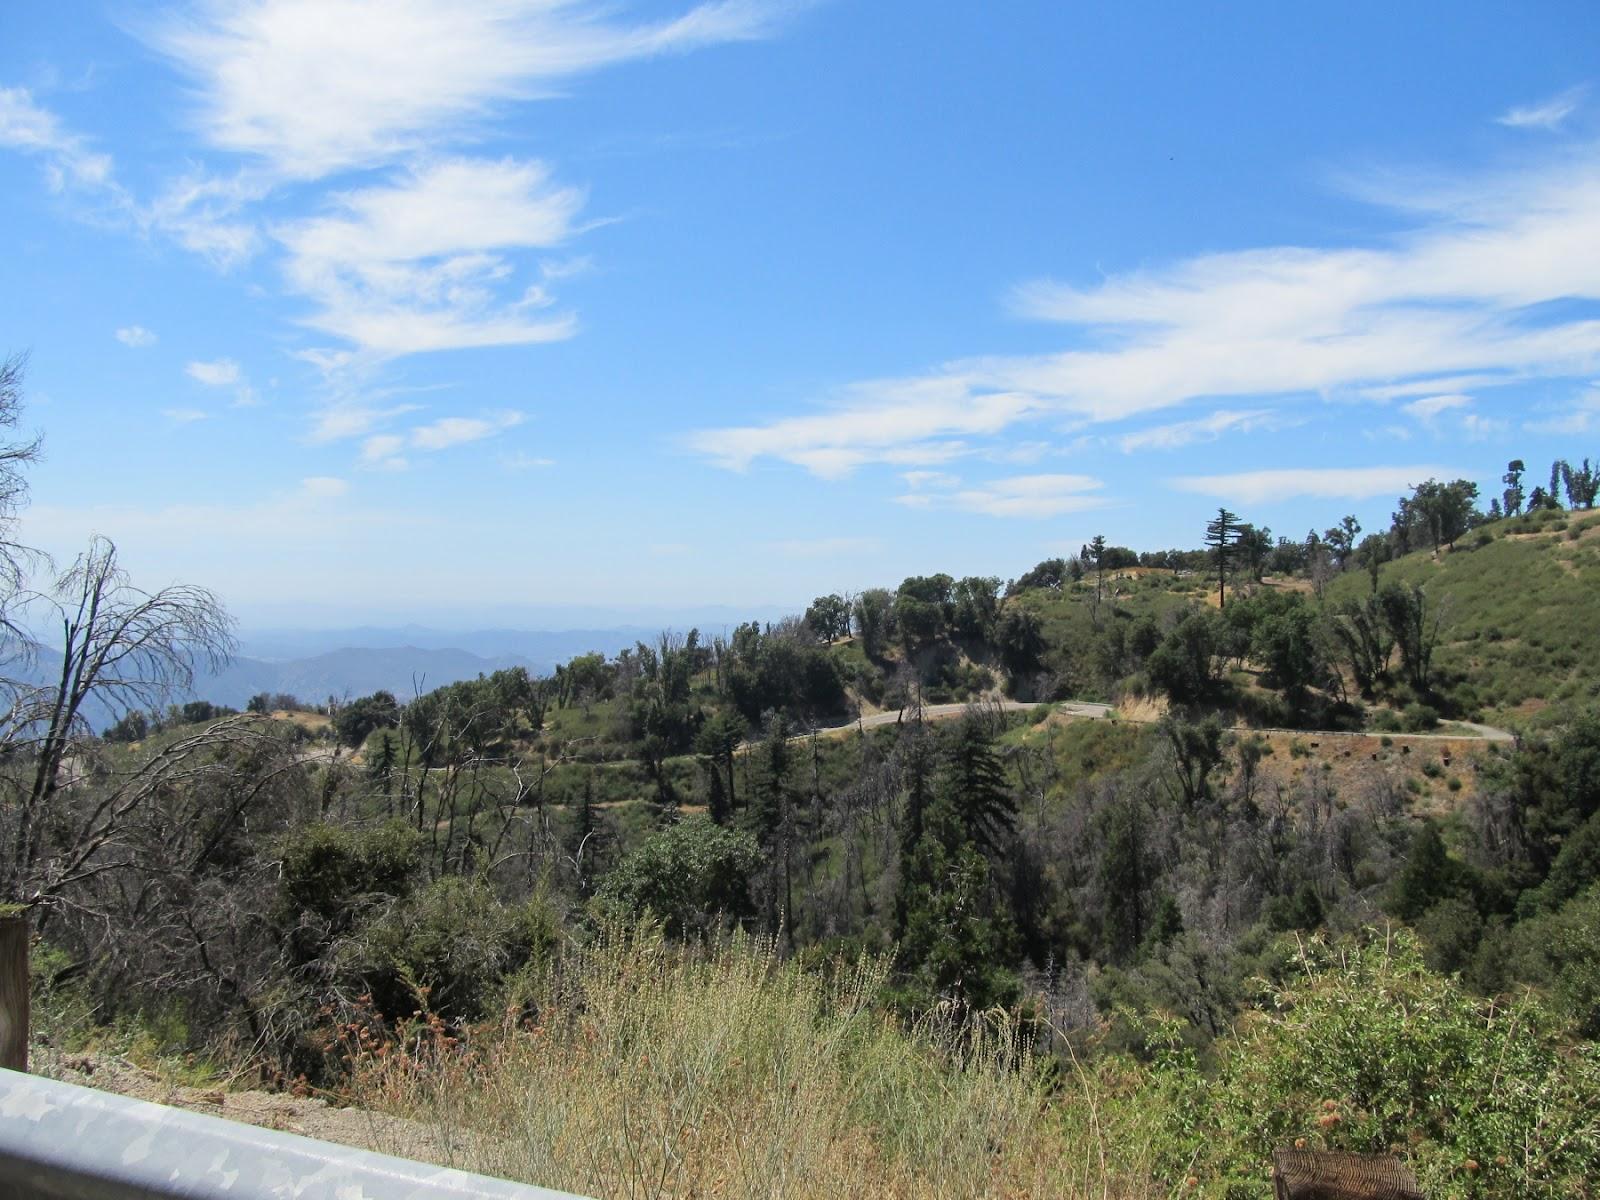 b7e519549 Pre-riding the hilly bit of the 2012 Giro di San Diego gran fondo (Lake  Wohlford